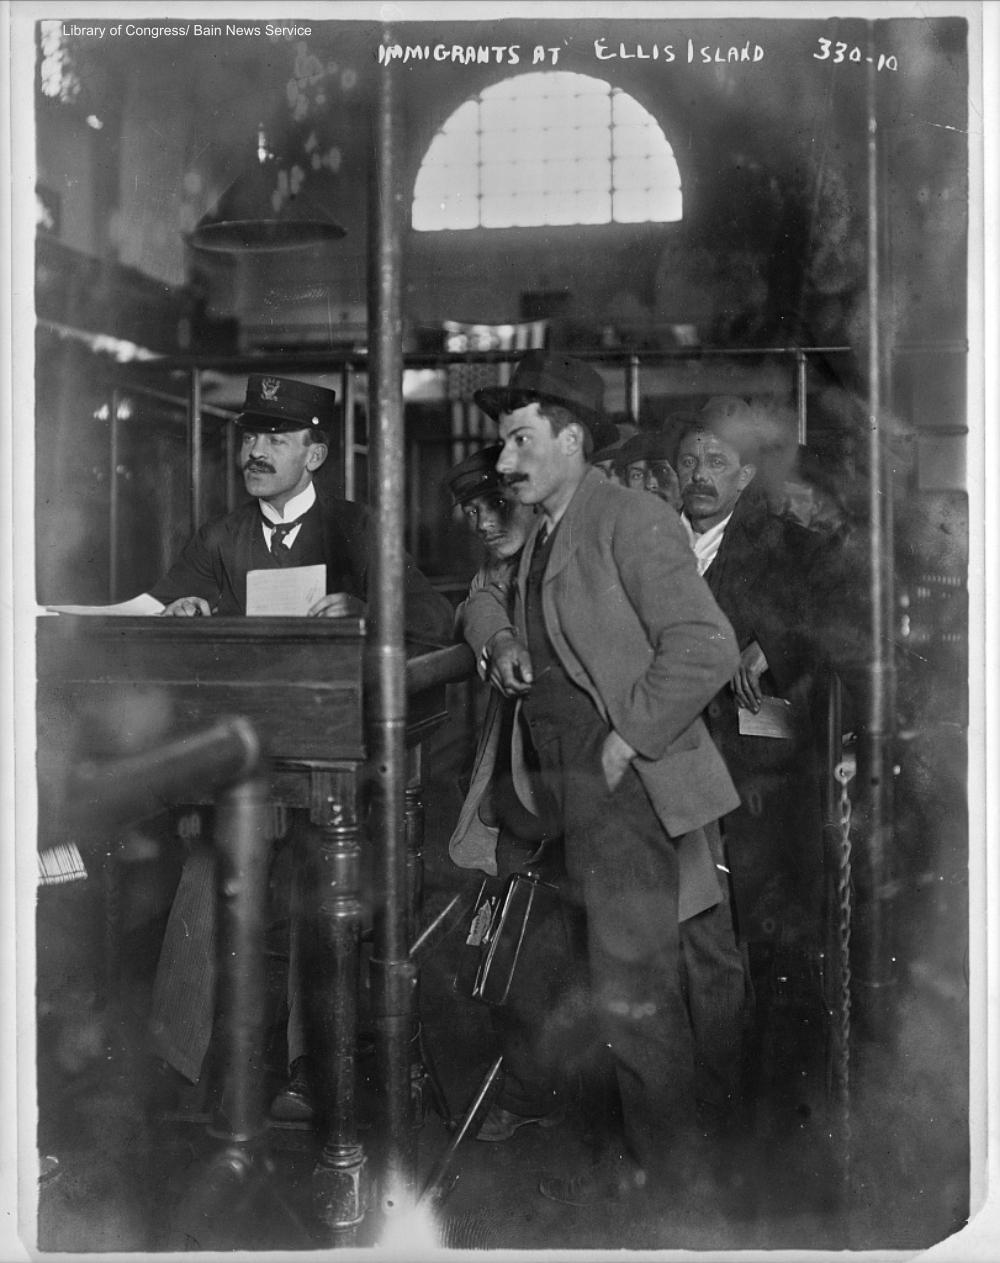 Ellis Island Circa 1910